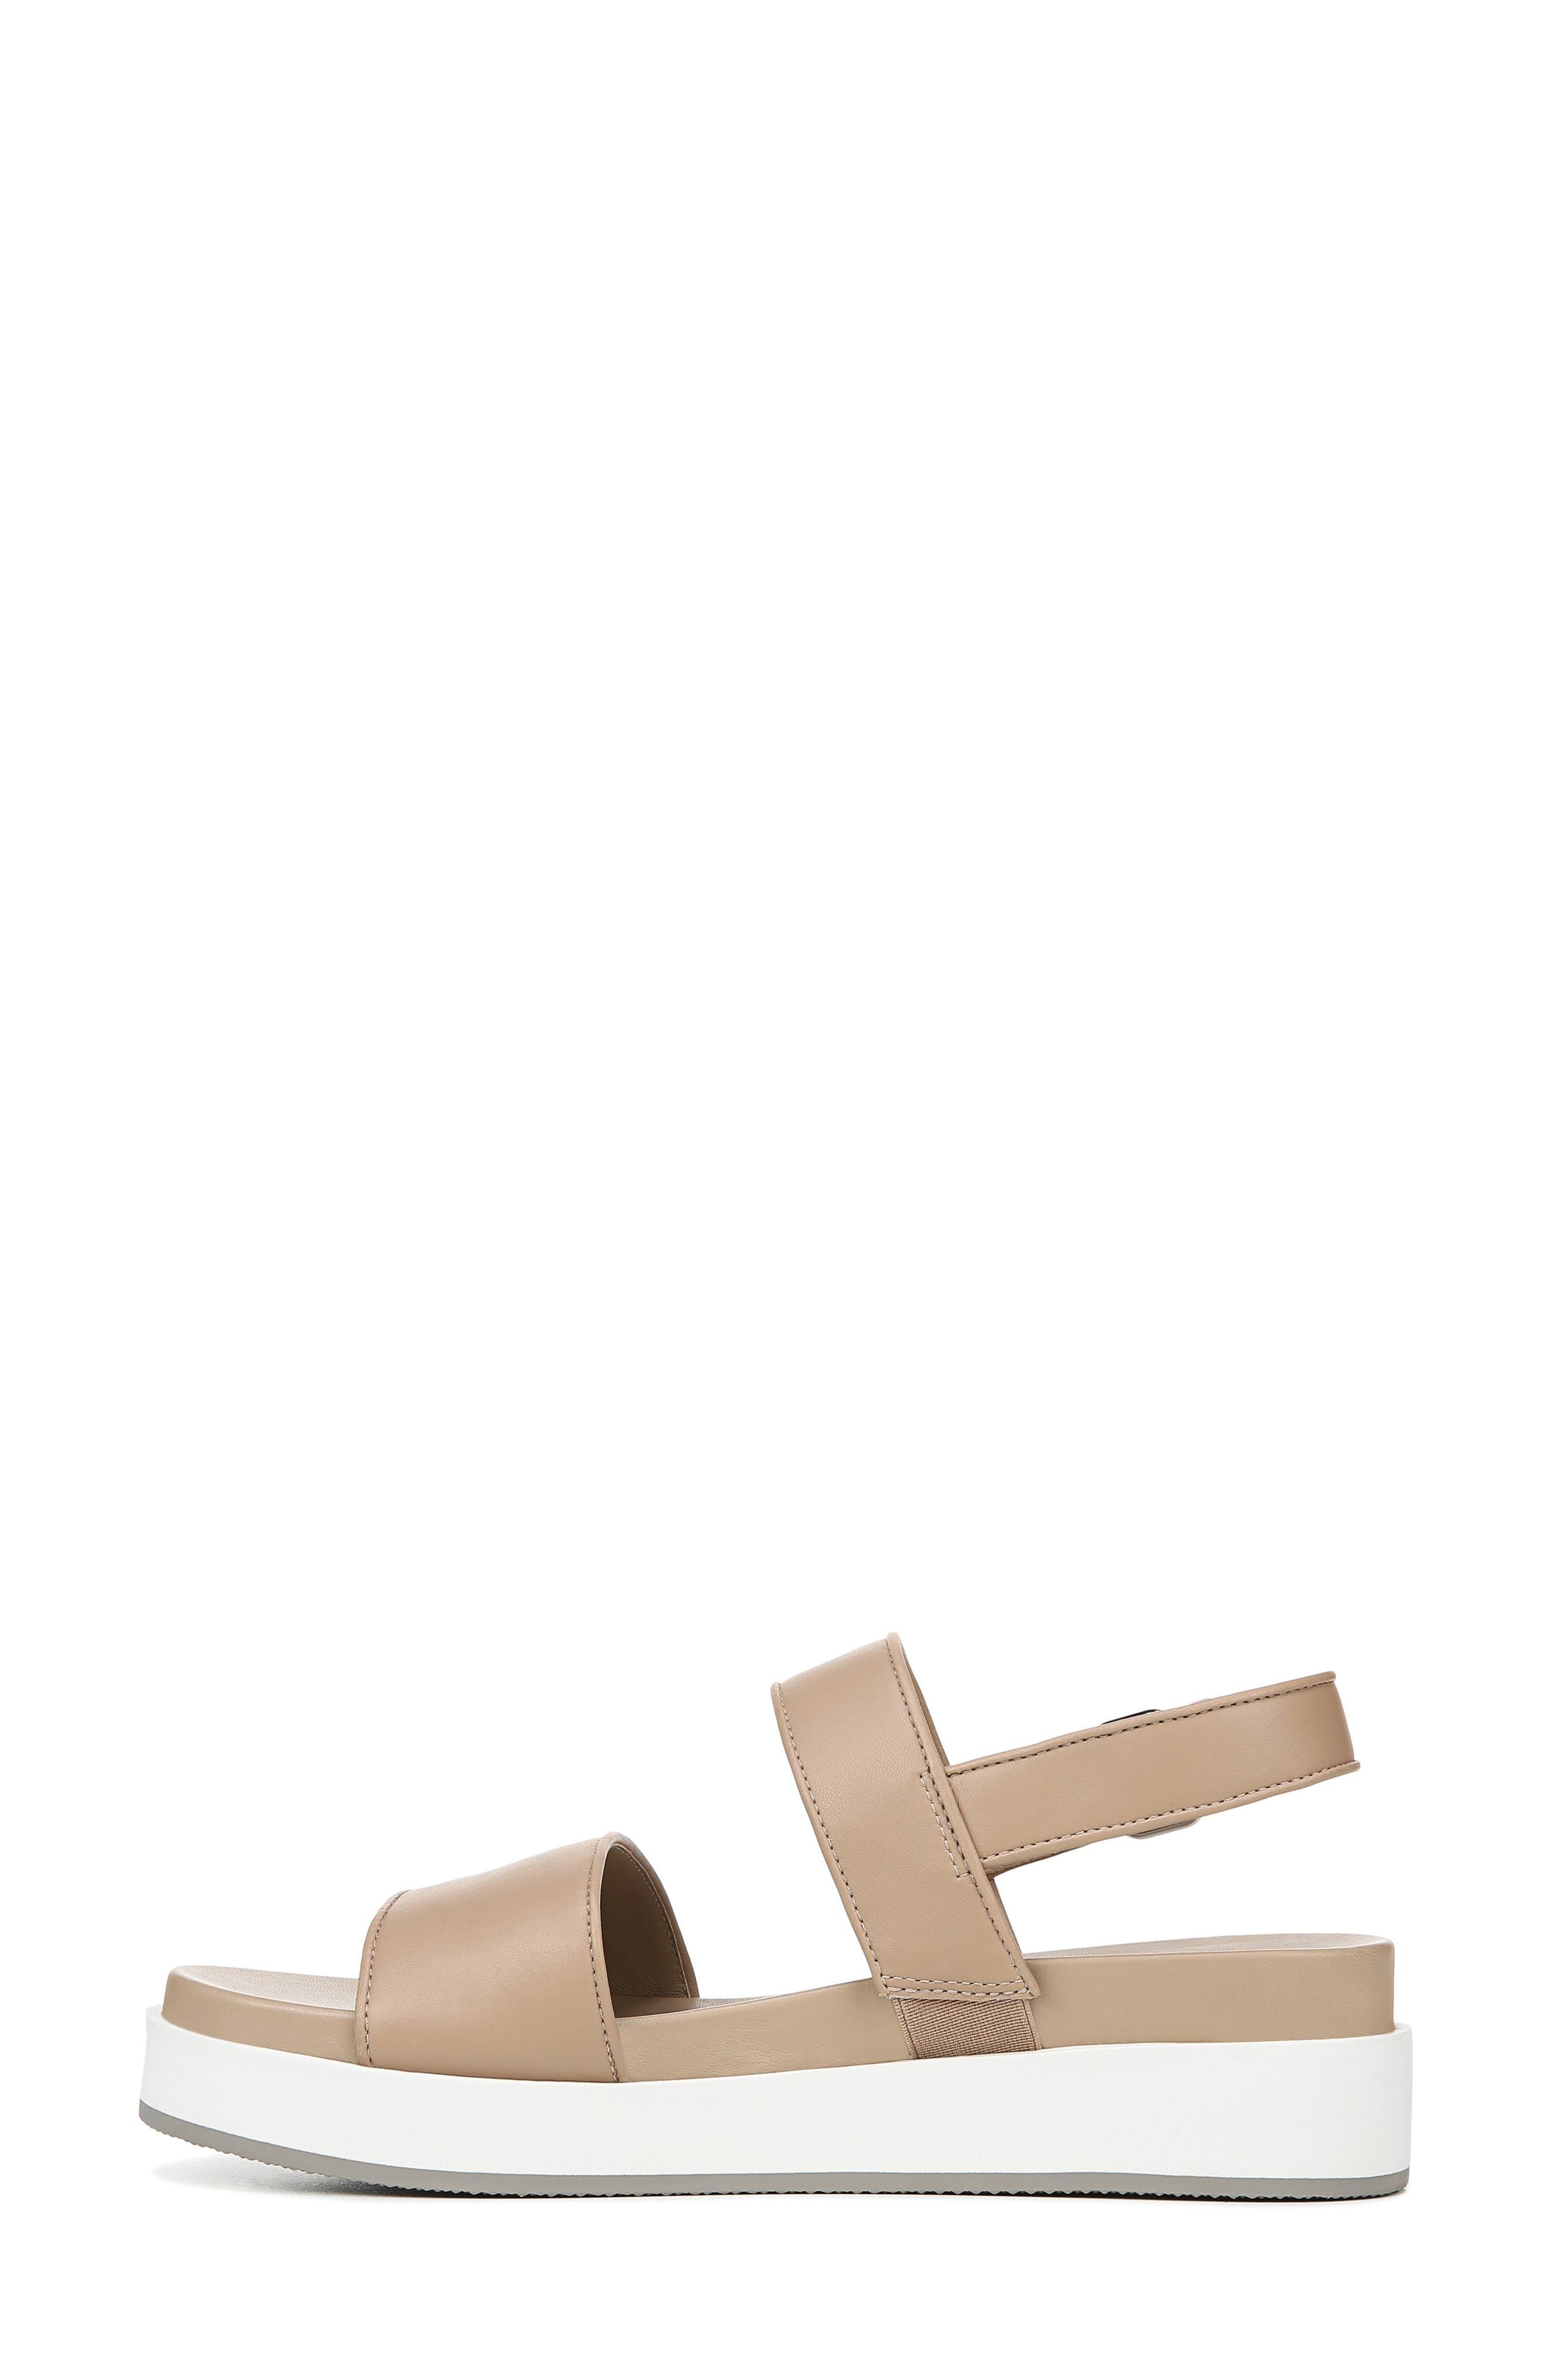 VIA SPIGA, Davi Platform Sandal, Alternate thumbnail 8, color, DESERT NAPPA